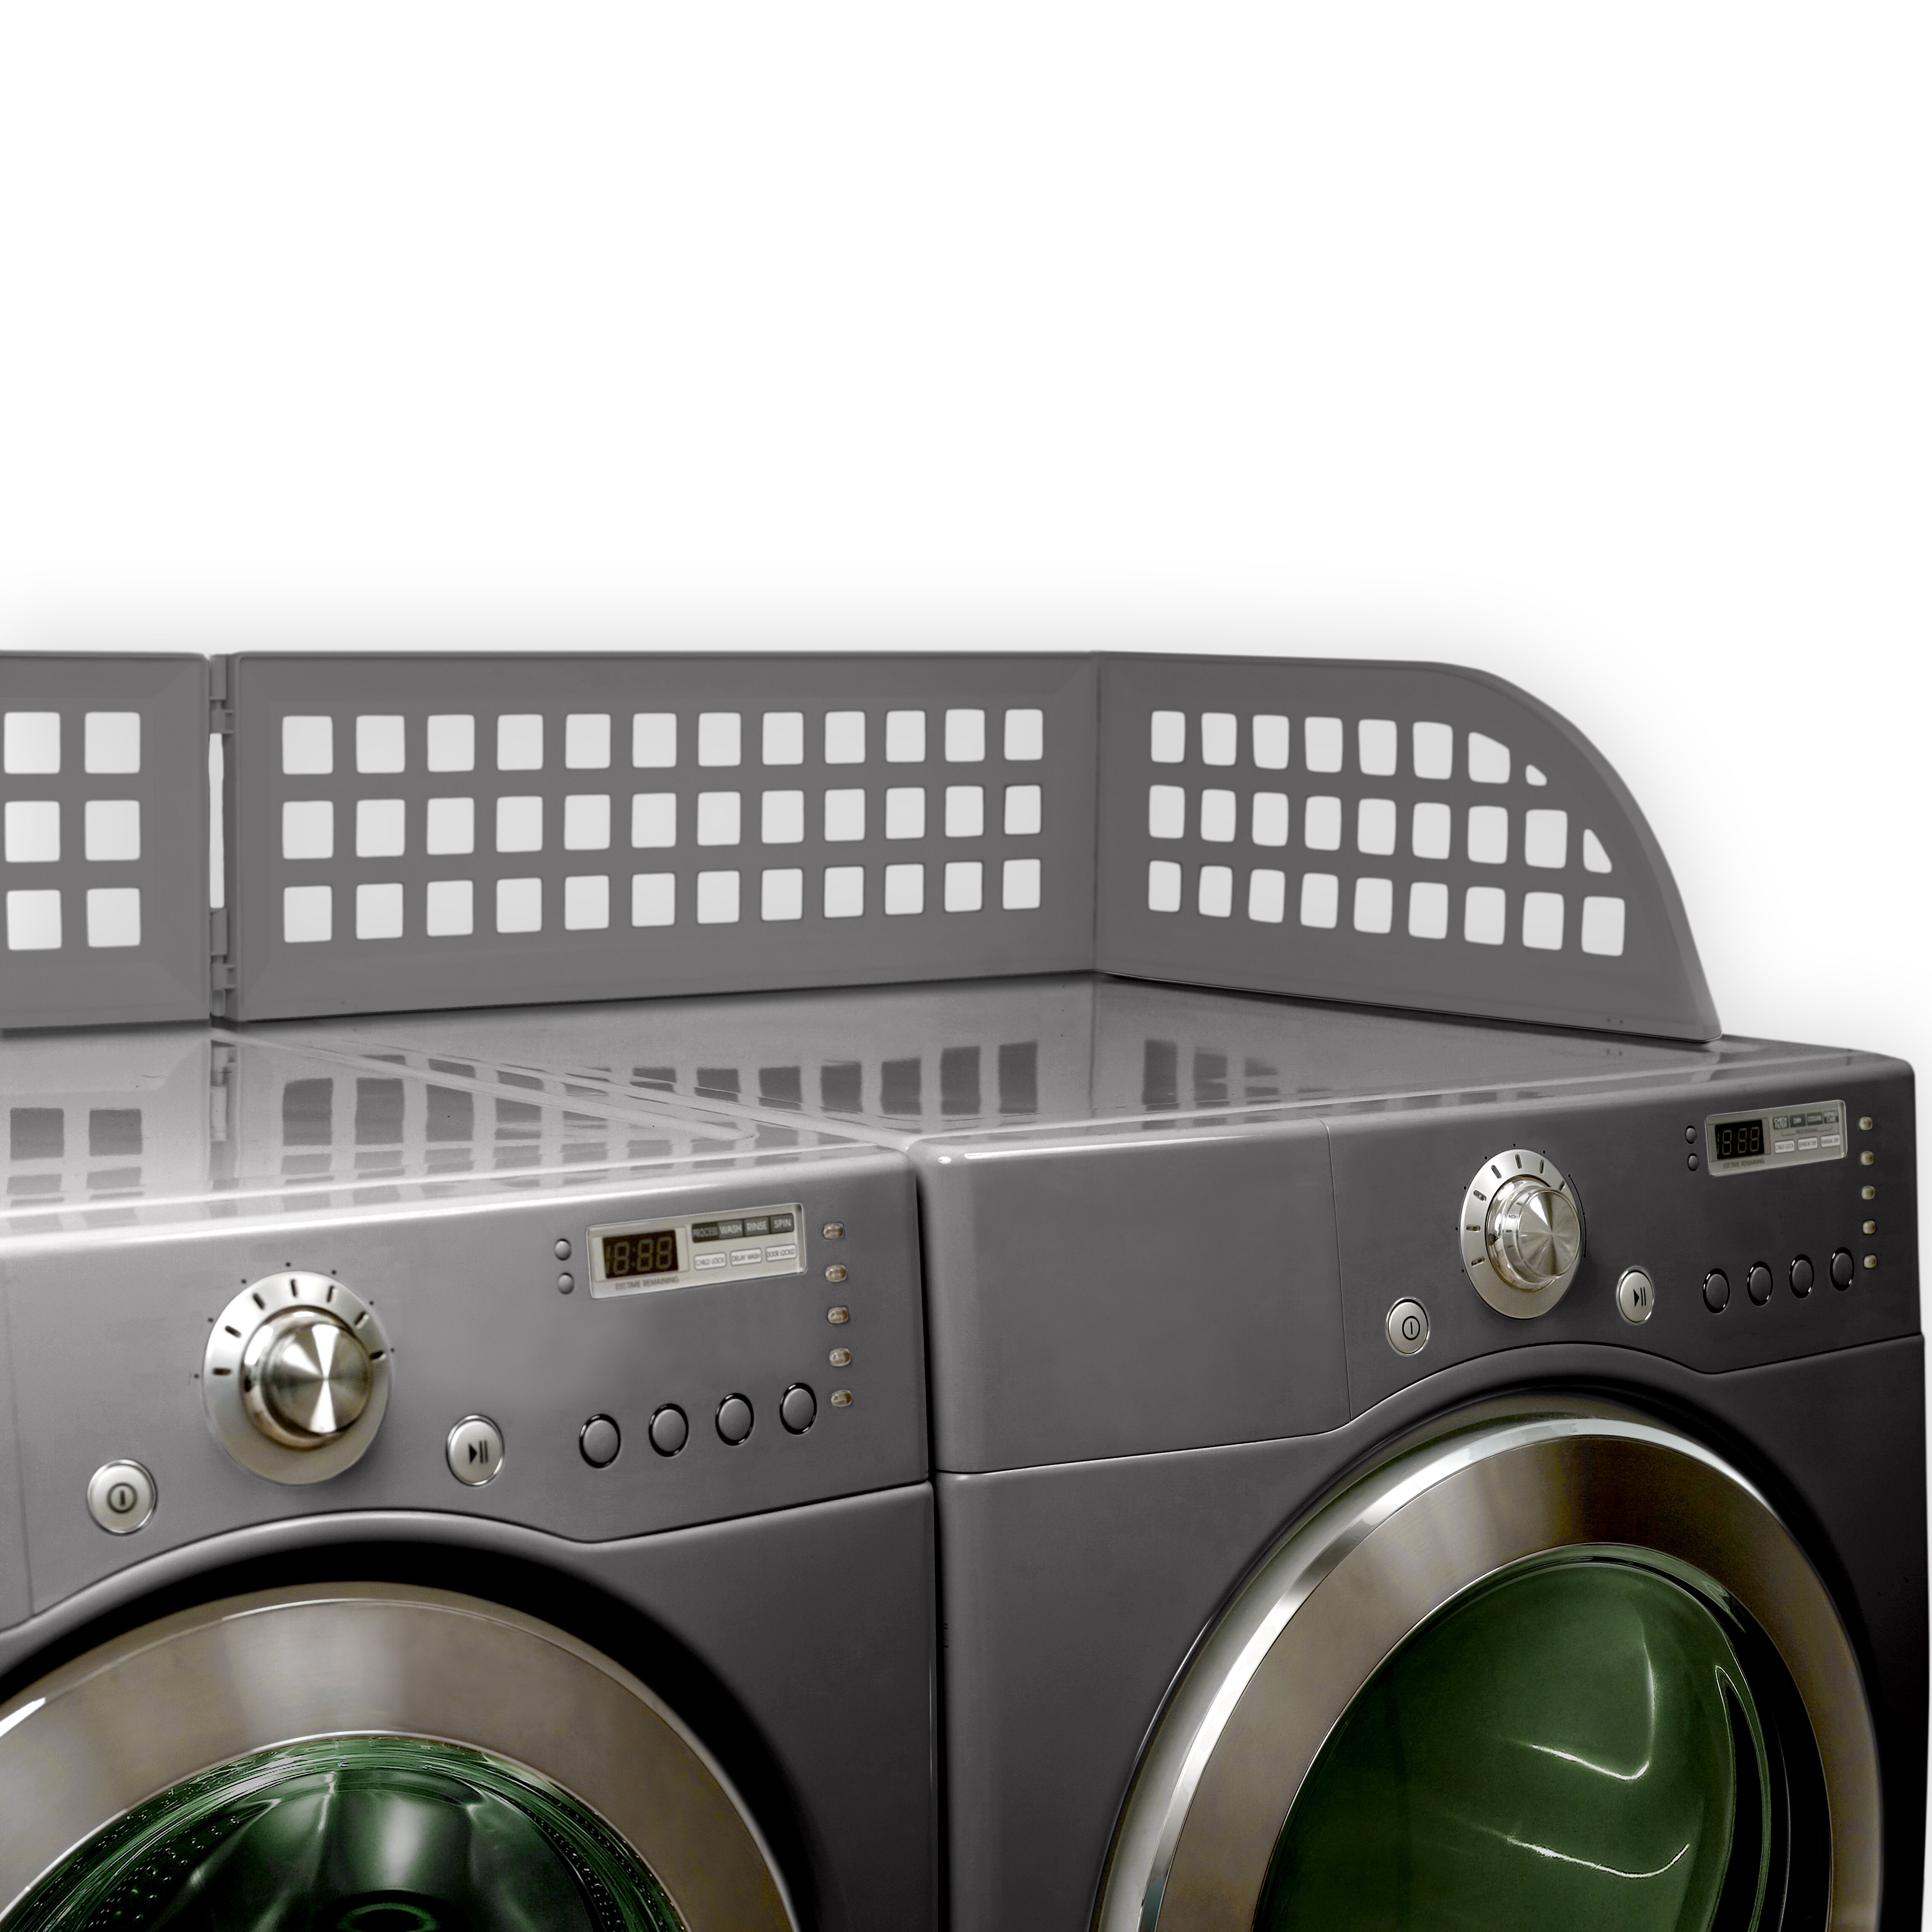 Haus Maus Laundry Guard Laundry Room Organizer Reviews Wayfair